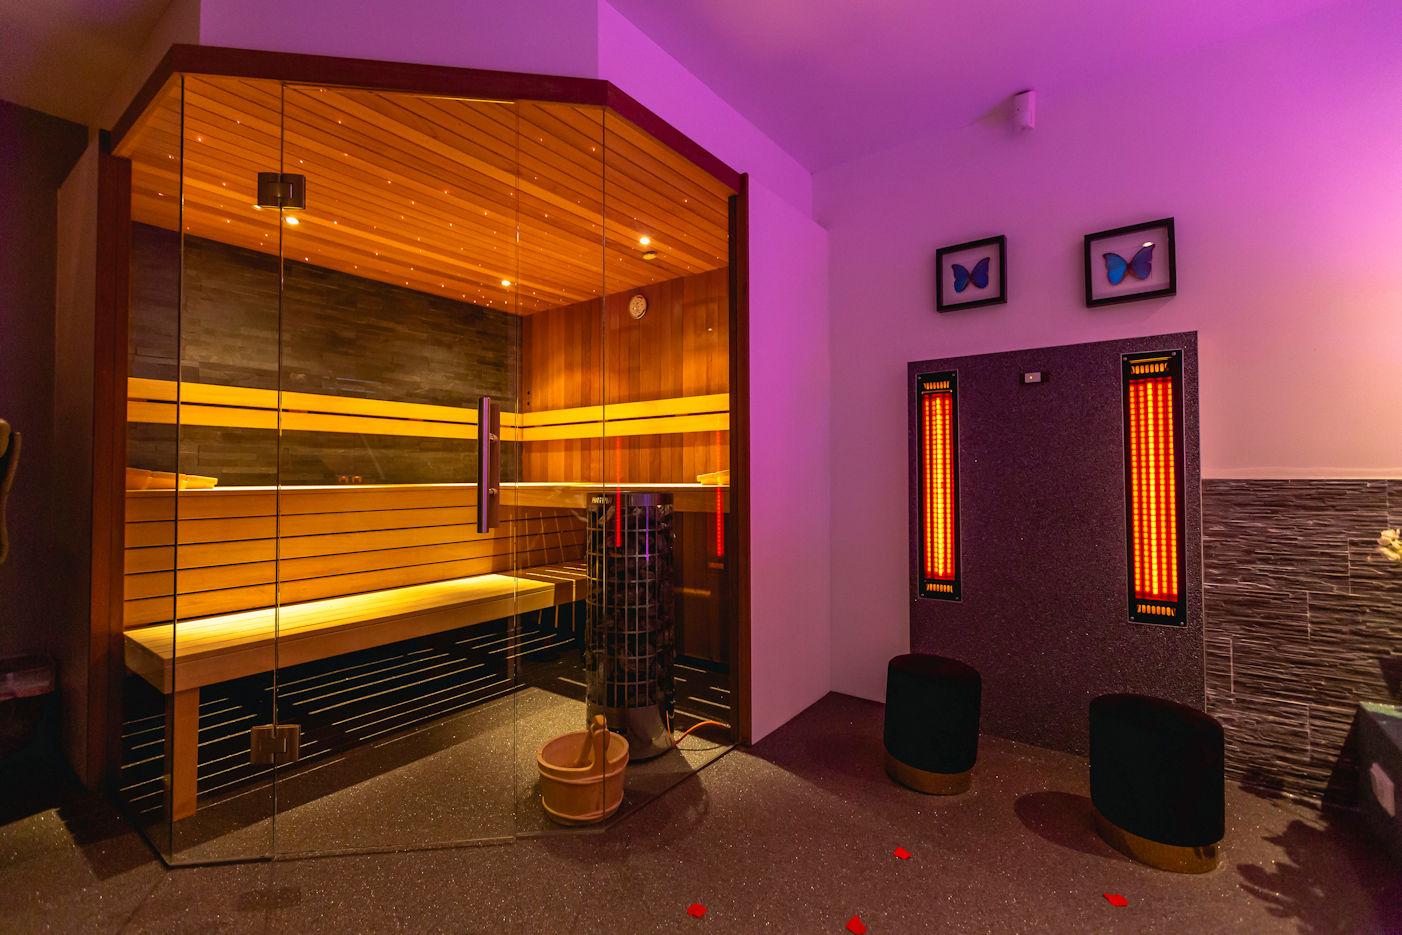 Sauna Gelukshuis Eindhoven